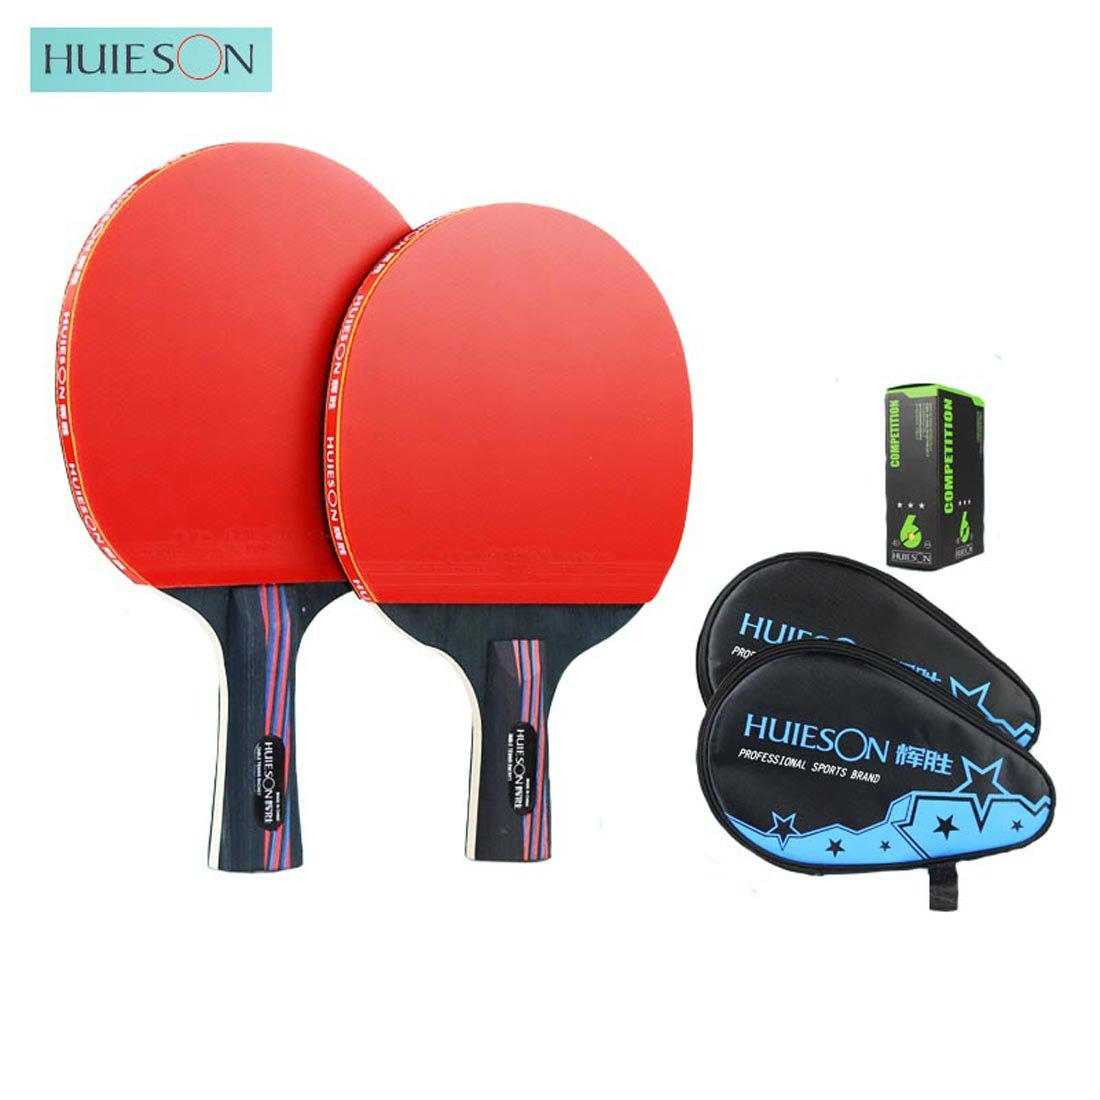 Nano Carbonization木製トレーニングやゲームDefensiveタイプテーブルテニスラケットピンポンパドル B075DFTC5B  knife grip+Penhold Grip